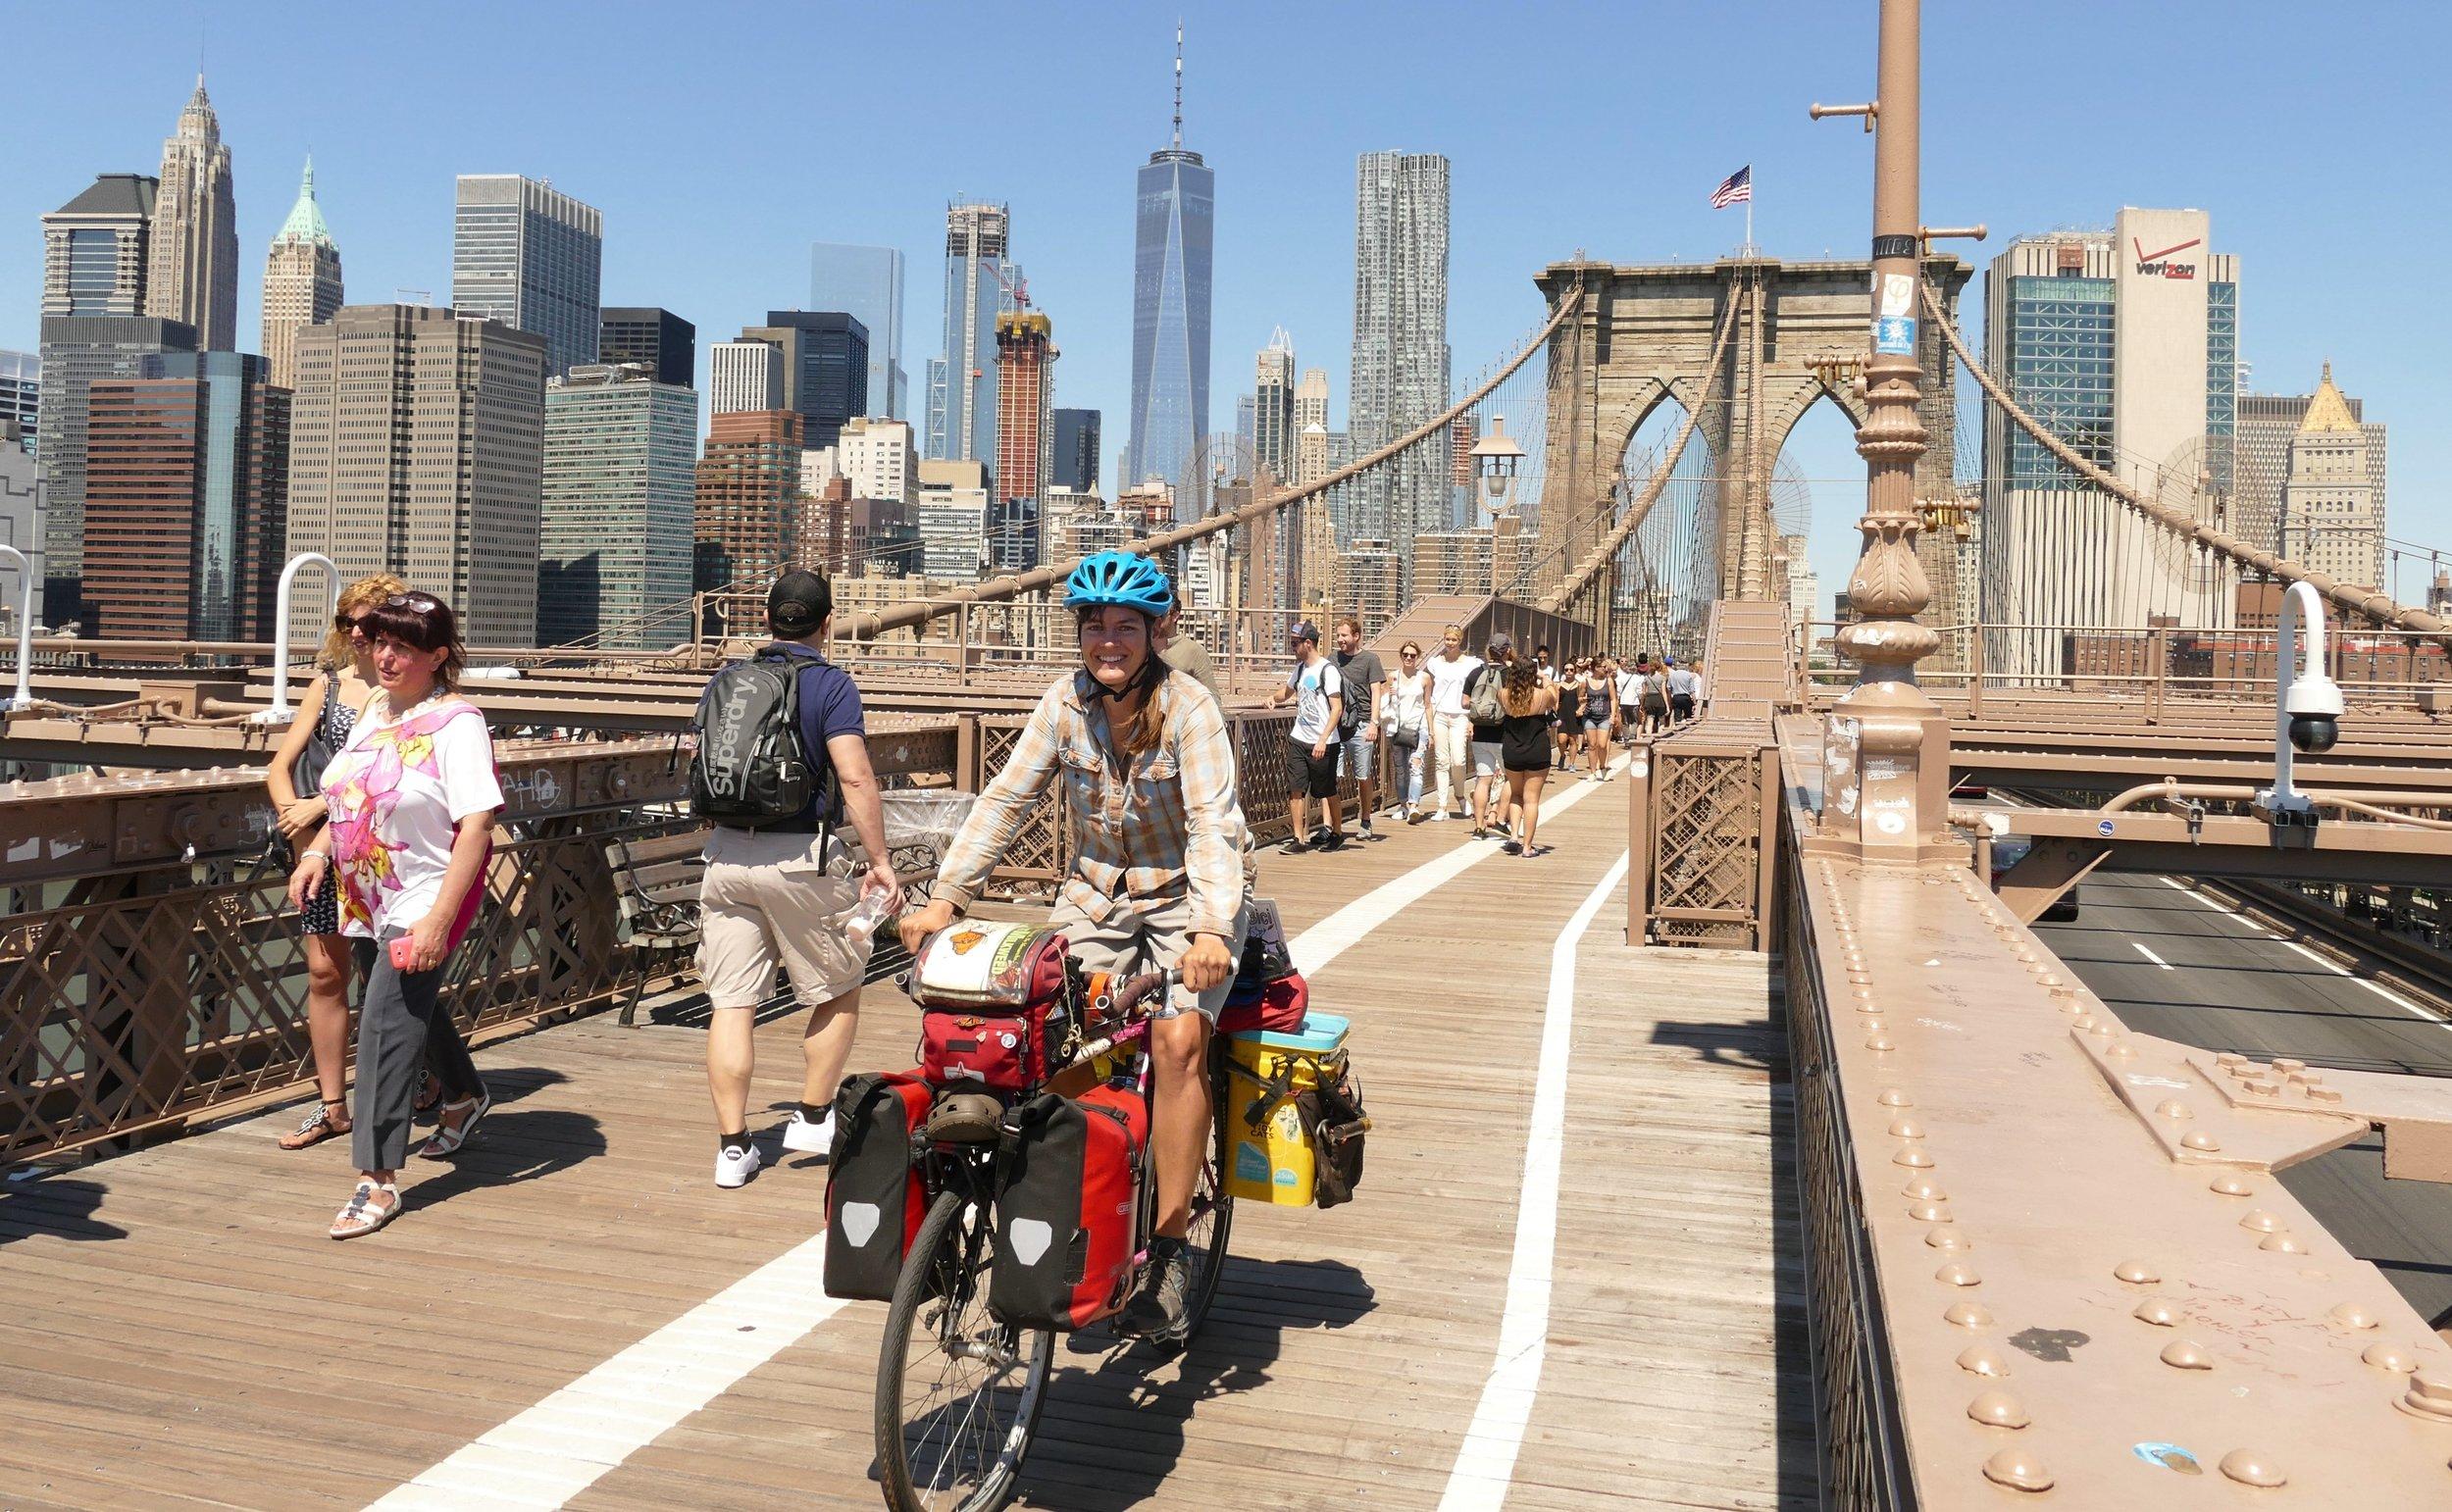 Crossing the Brooklyn Bridge was one of my favorite adventures during my New York city visit.